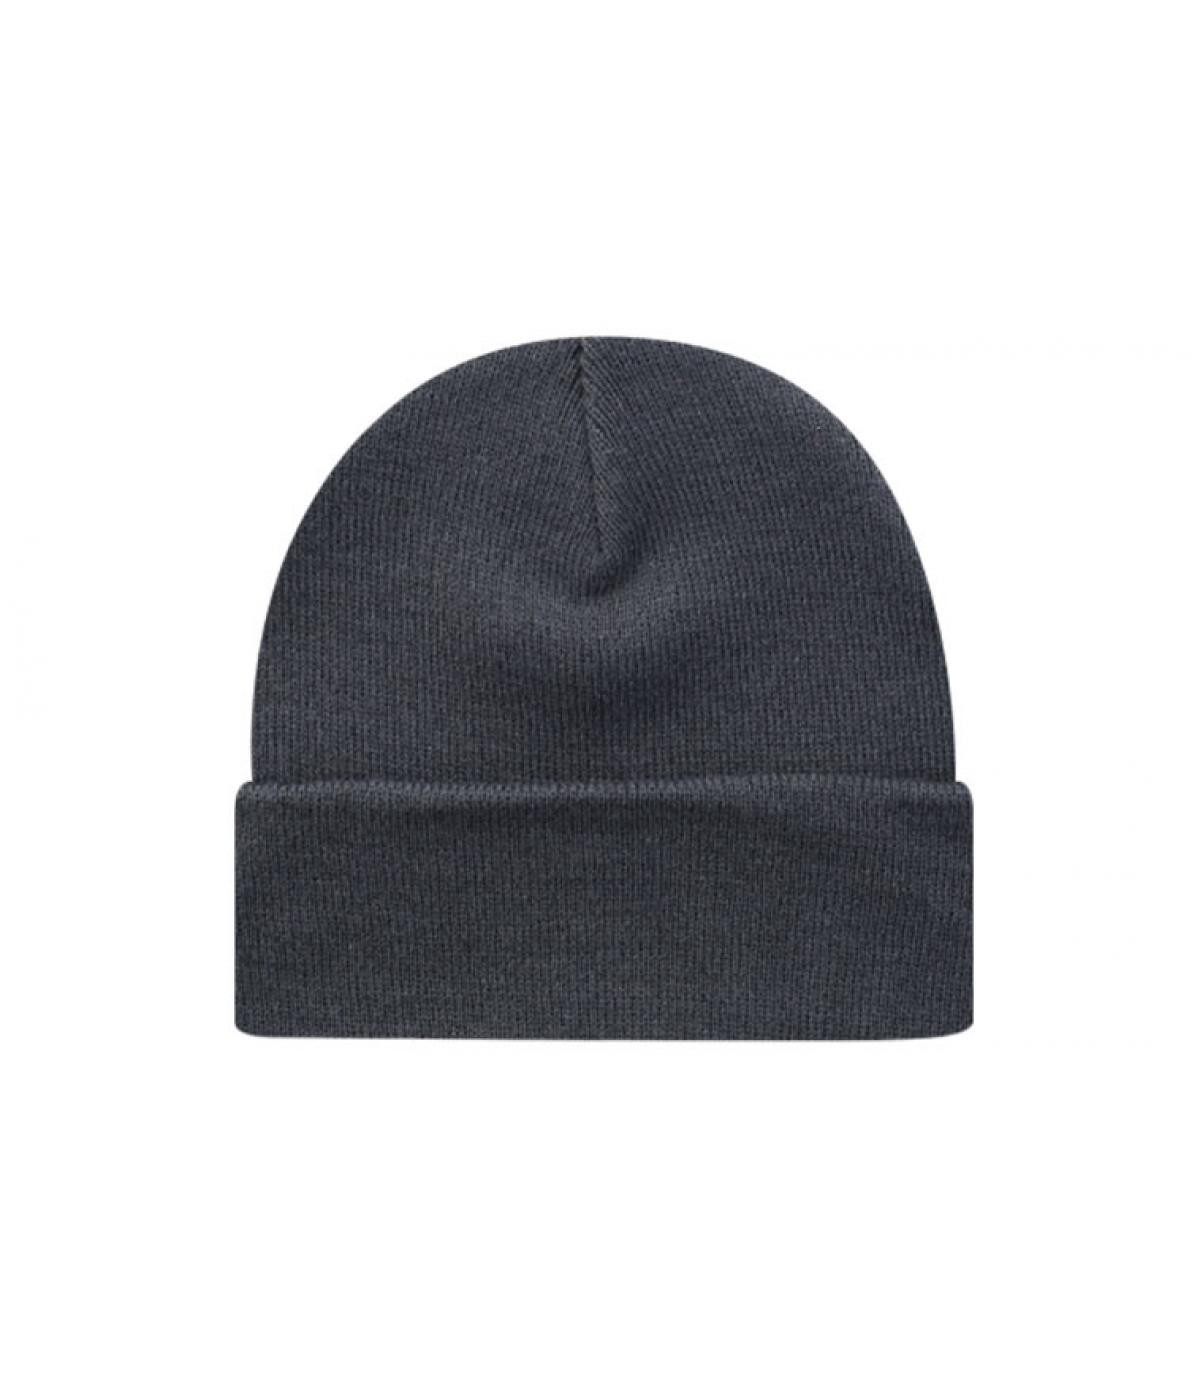 bonnet blank charcoal